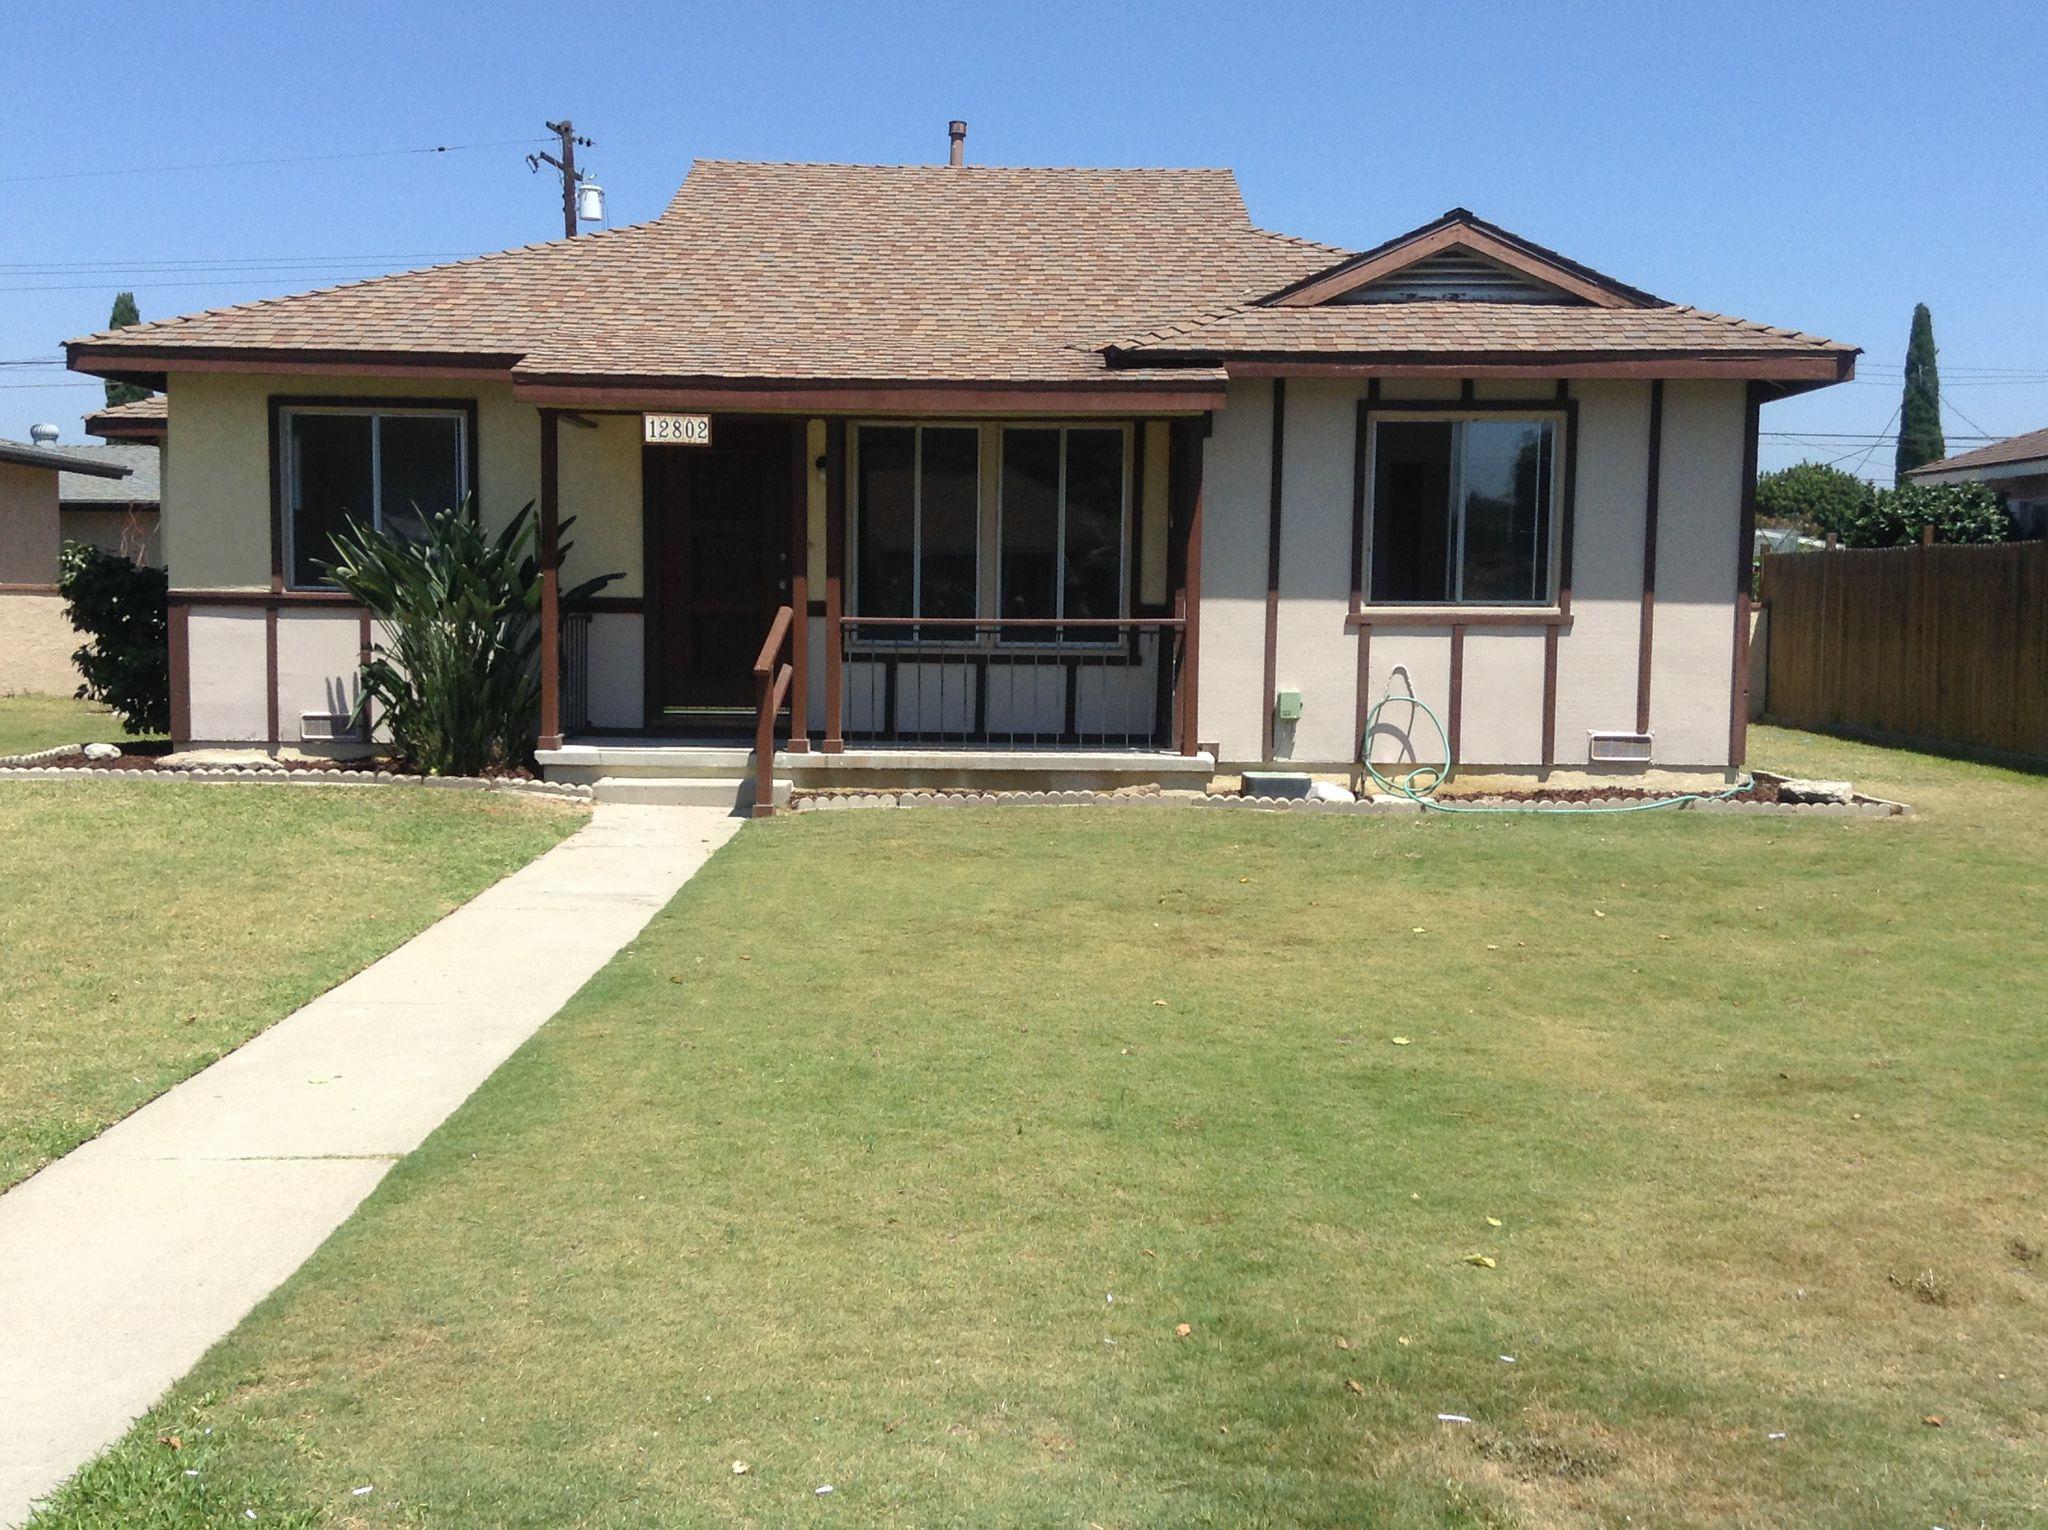 12802 Lemonwood Ln, Garden Grove, CA 92840 - Estimate and Home ...